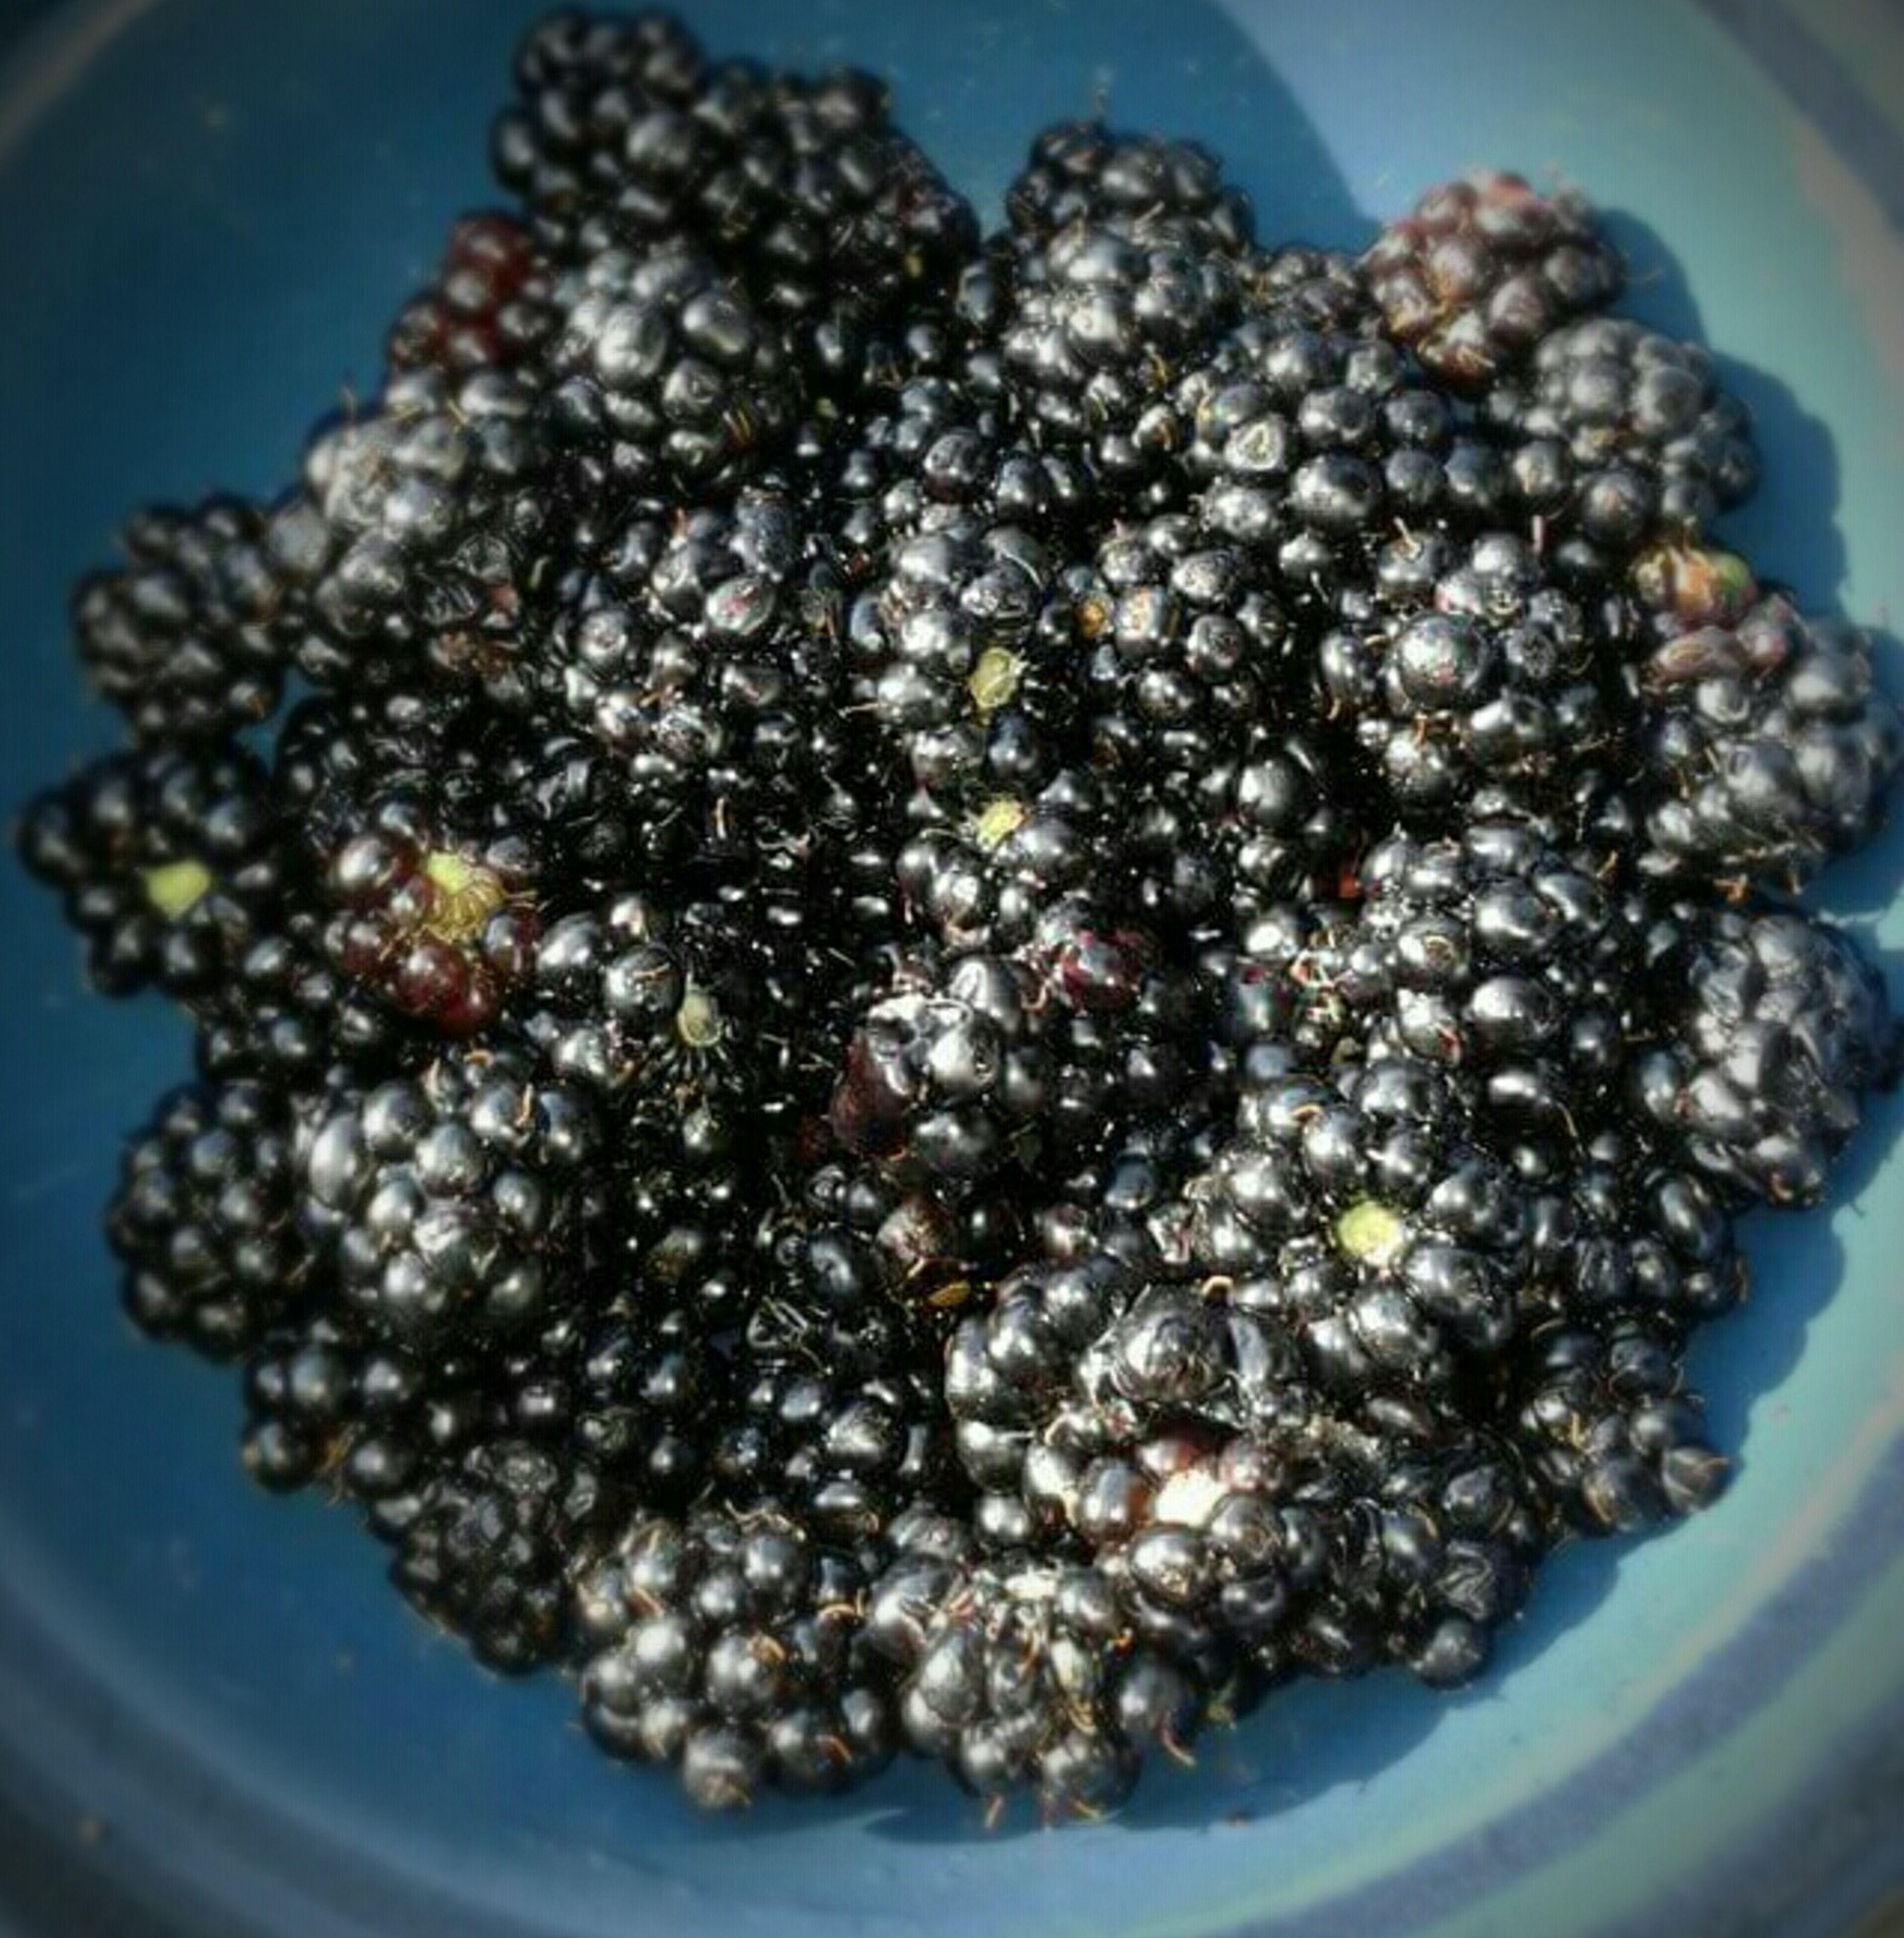 Blueberries that i Handpicked . Yummy Littlefruits Natureisamazing Natureislife